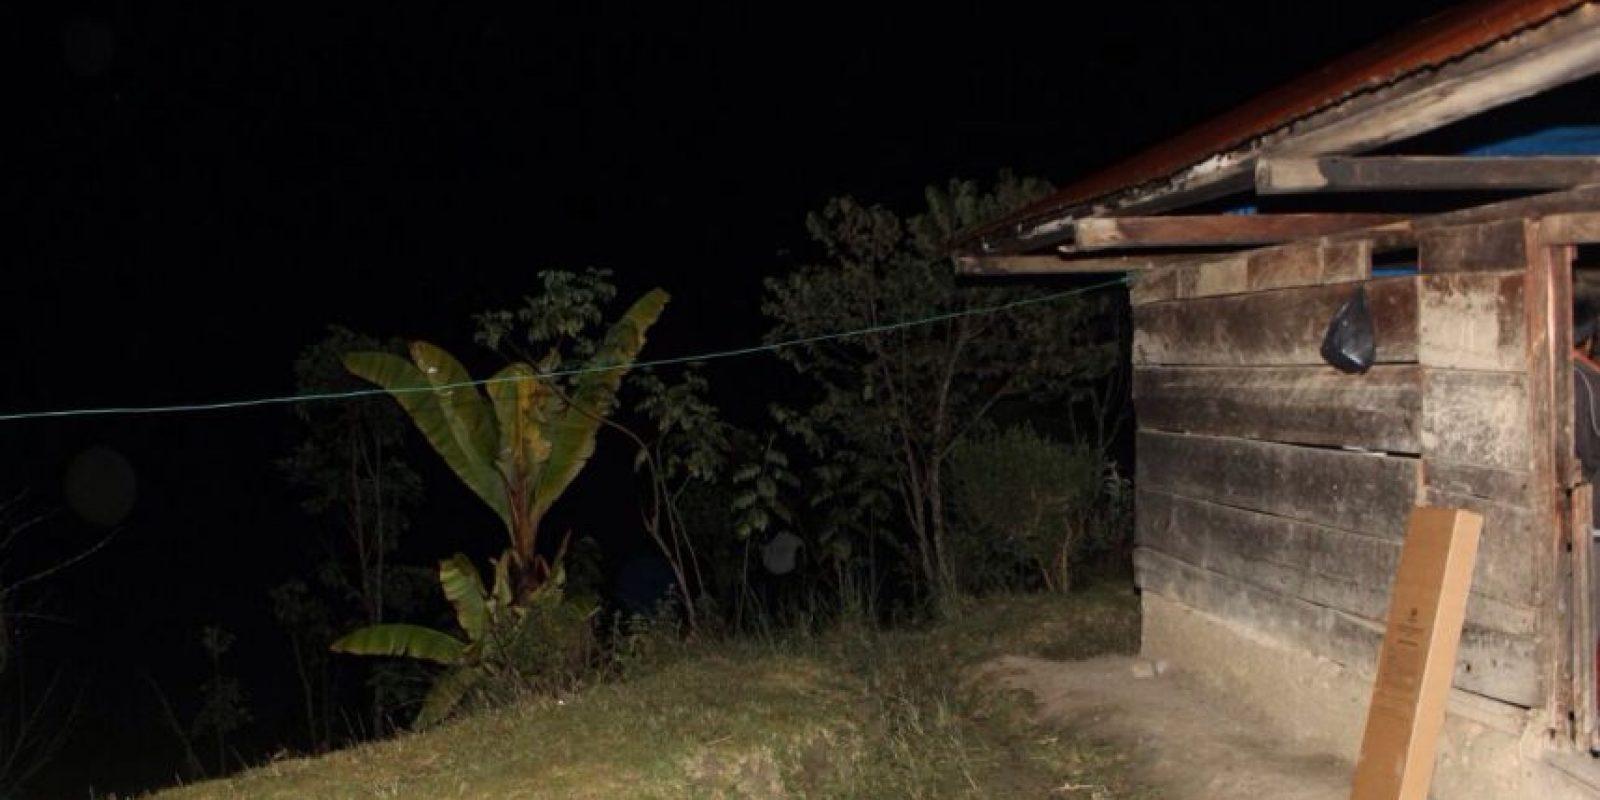 El niño ha sido localizado muerto en la aldea Xopacal de San Juan Ixcoy, Huehuetenango. Foto:PNC